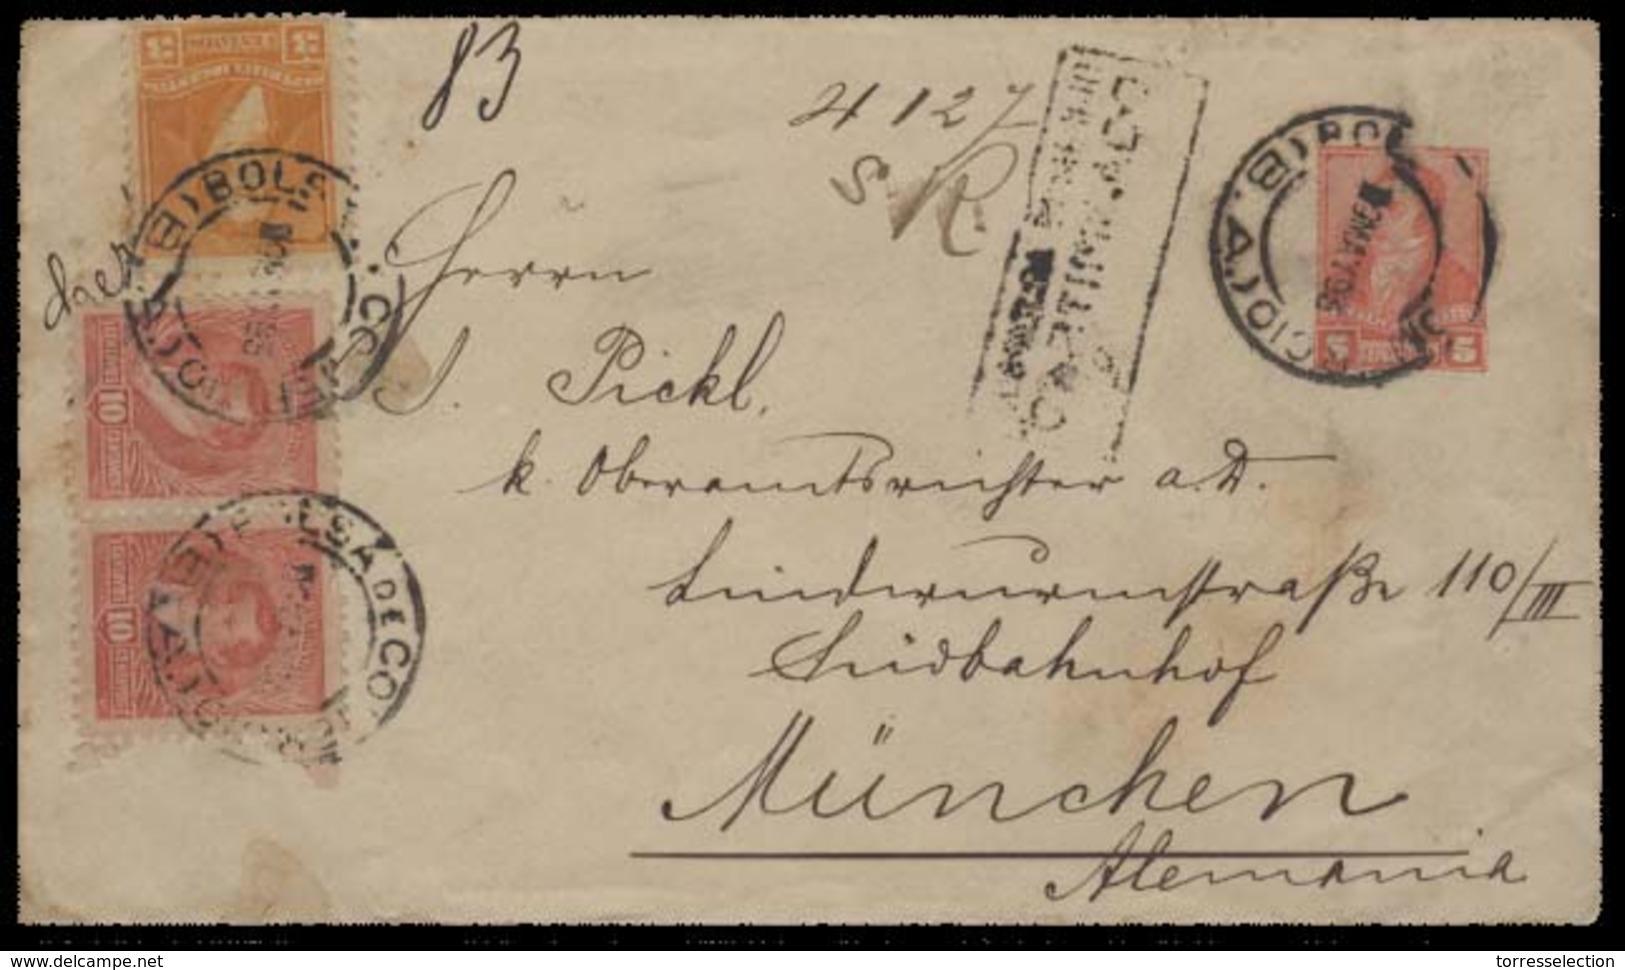 Argentina - Stationery. 1893 (9 May). Bolsa Comercio / BA - Germany / Munich (4 June). Reg 5c Carmin Rectangular Stat En - Argentine